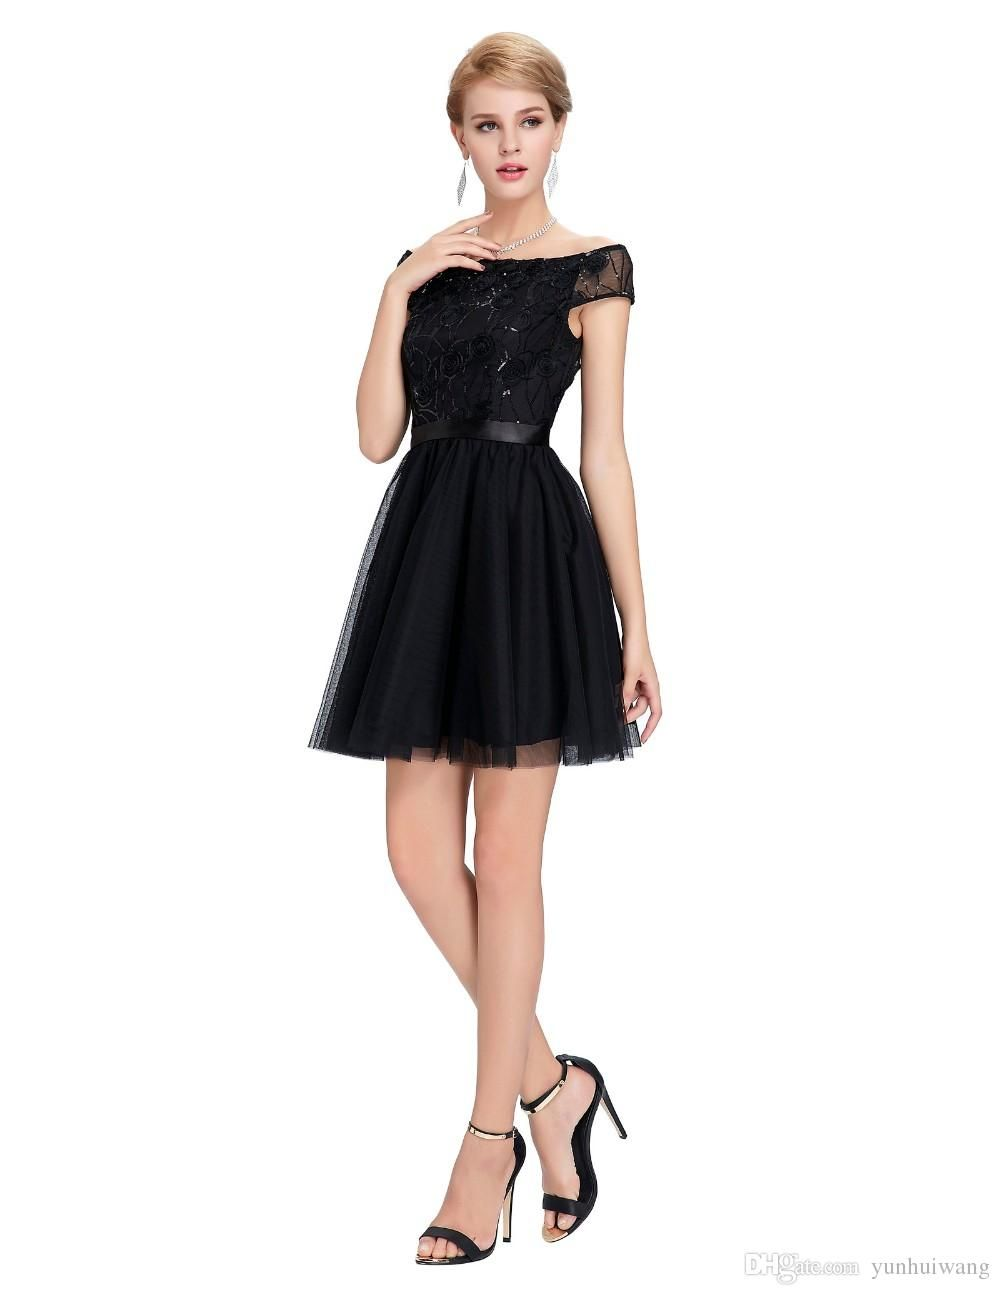 Dresses 8th grade graduation prom party dress